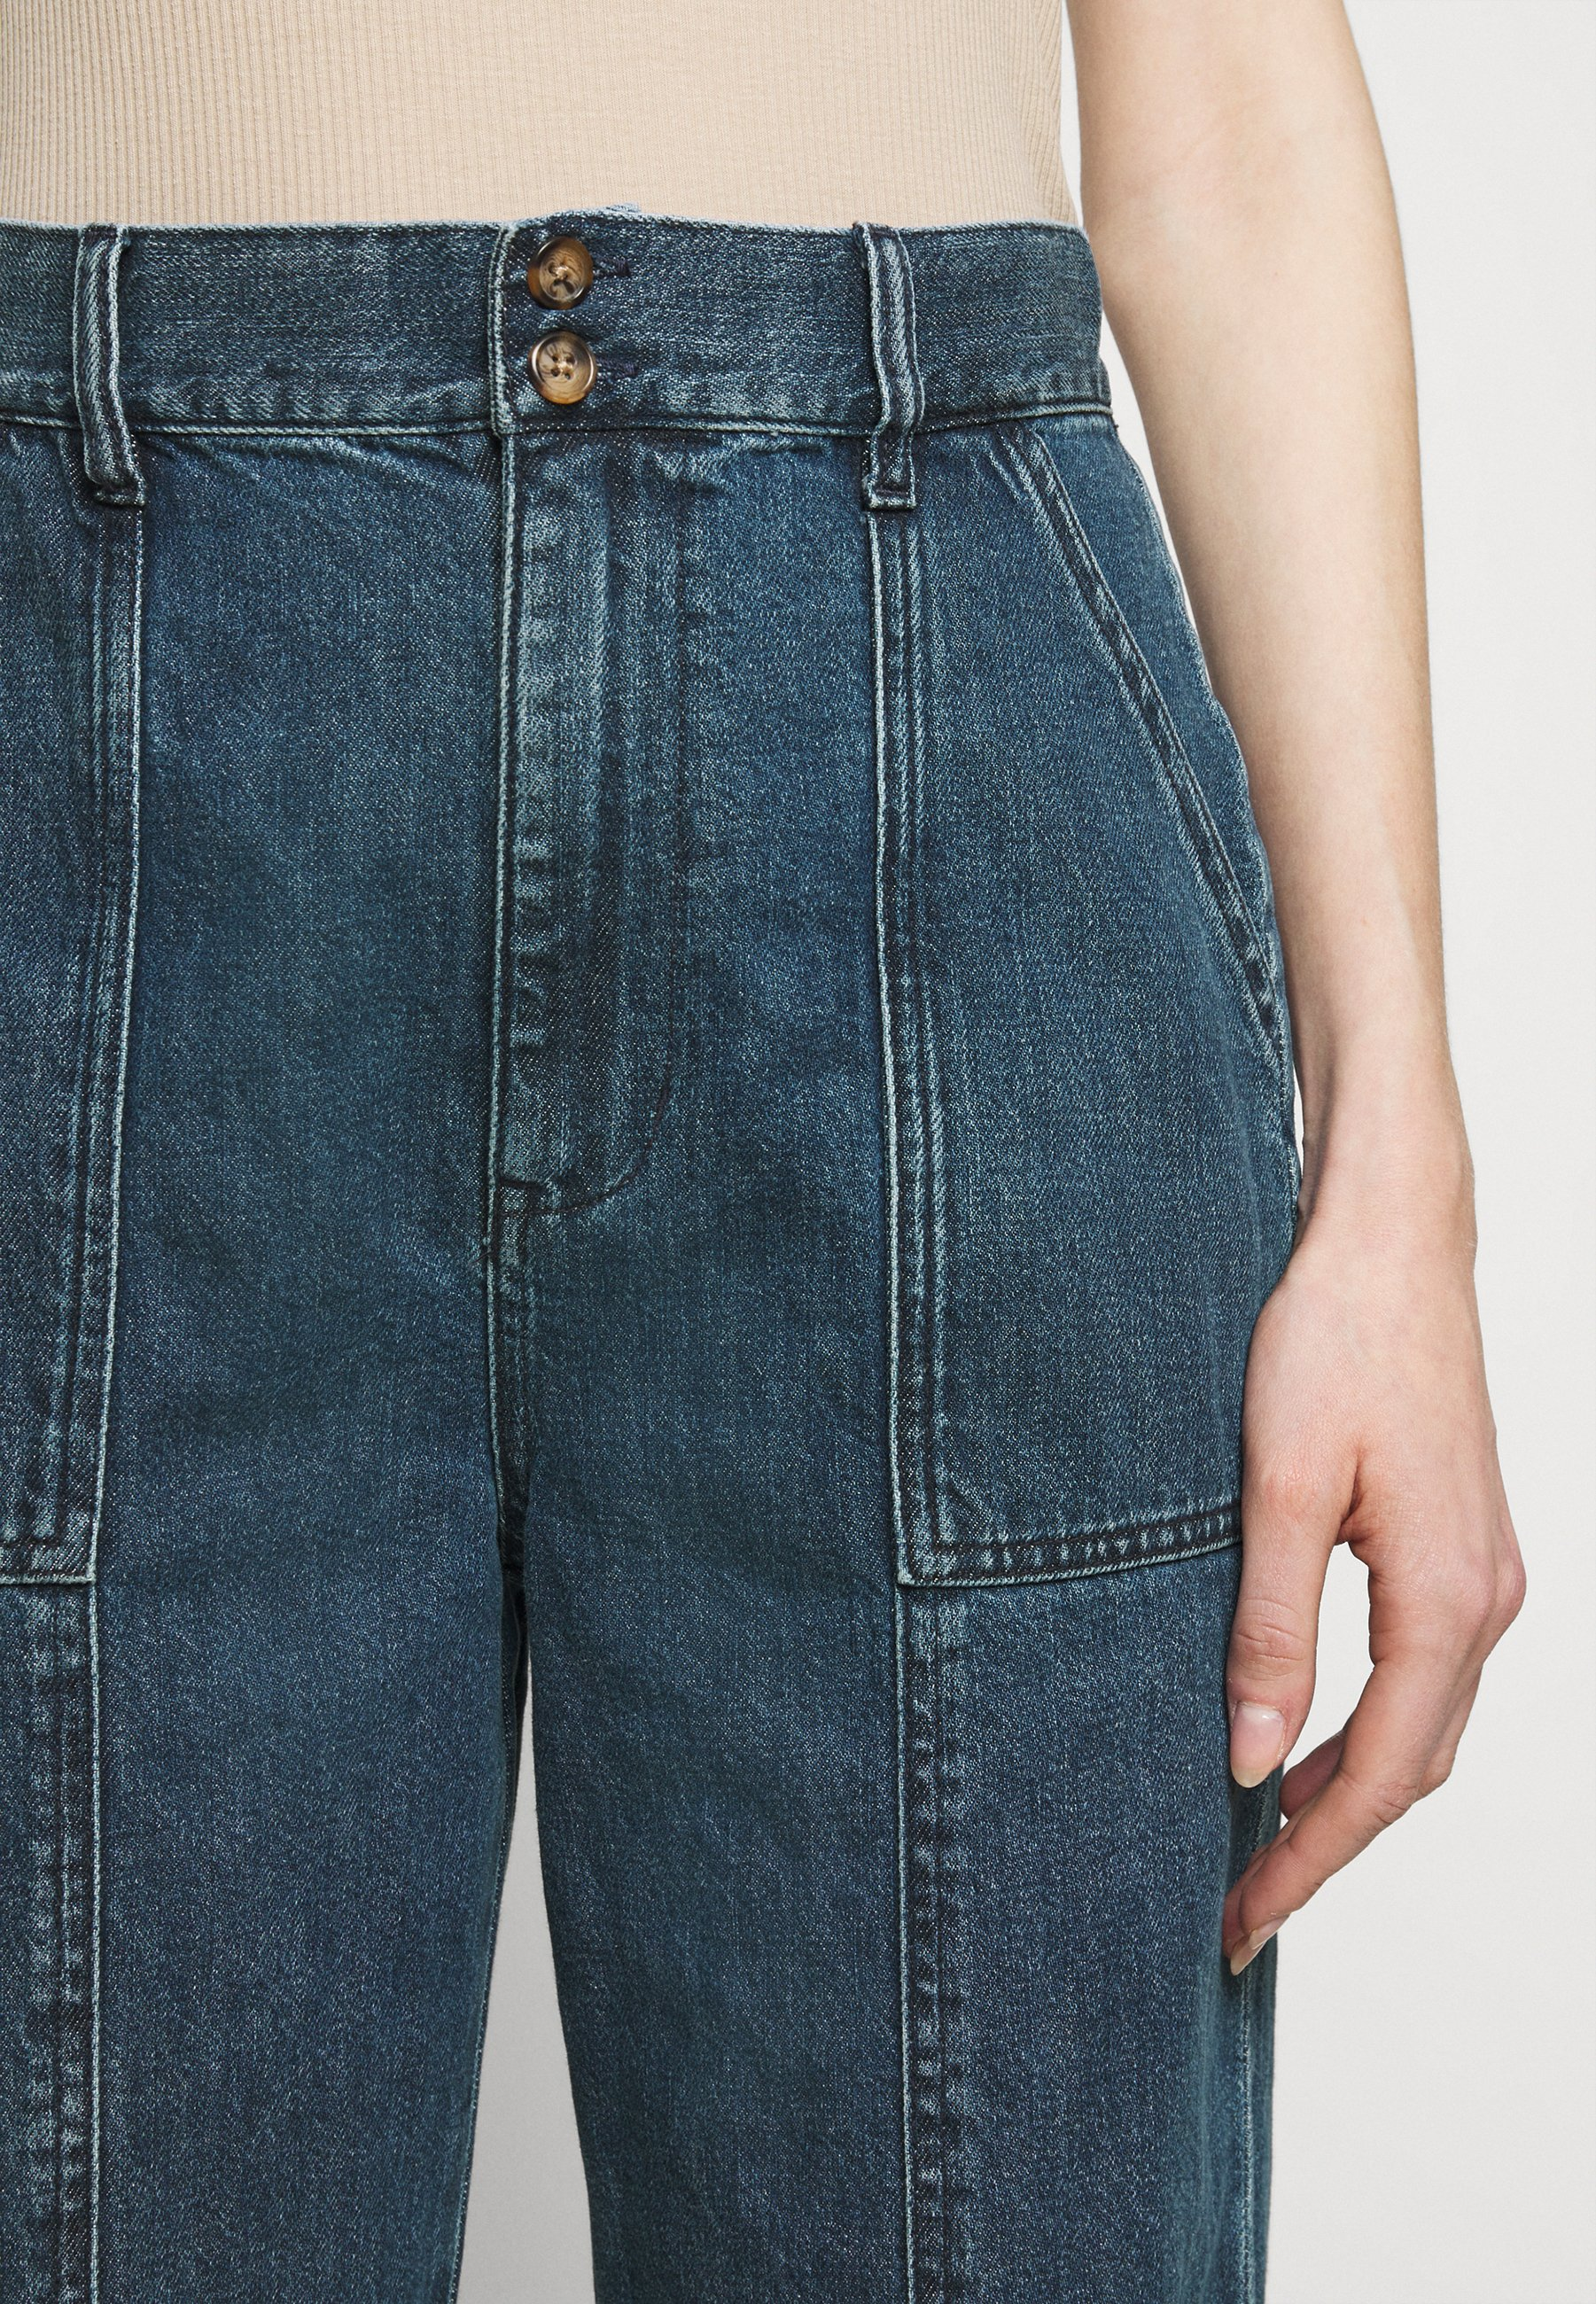 Femme THE NICO  - Jeans fuselé